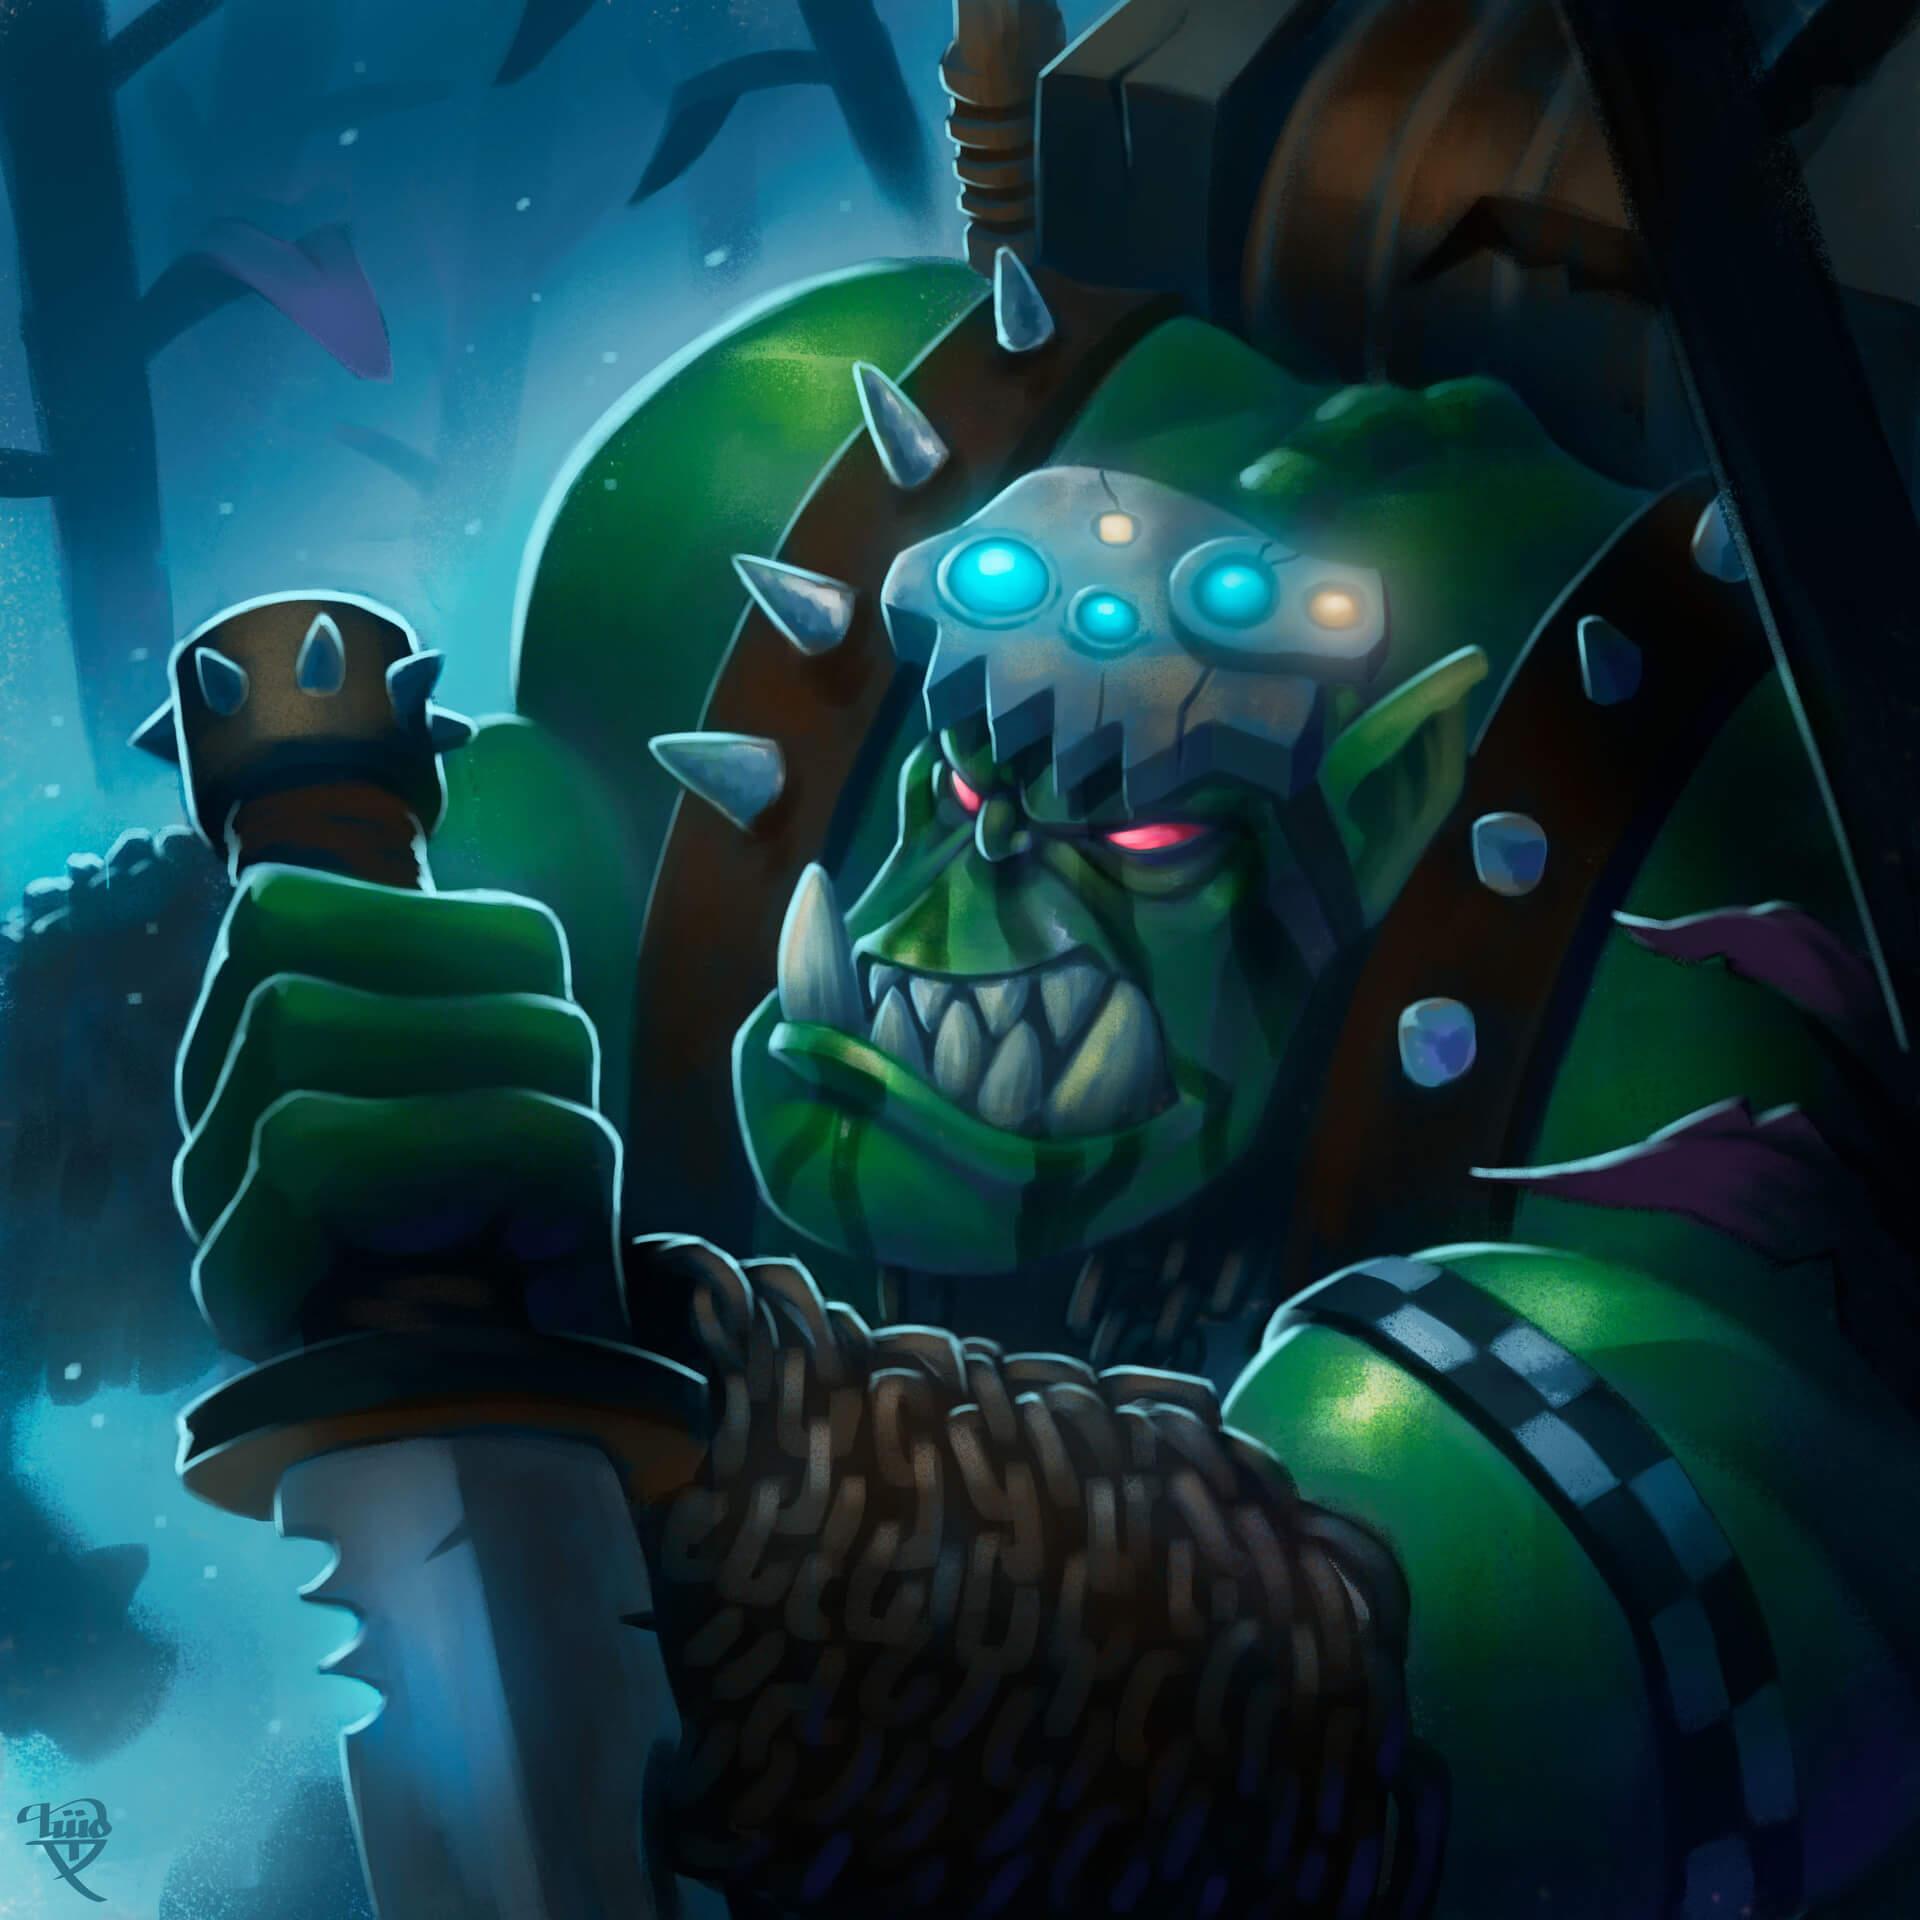 ilustración Tworents Warhammer 40K